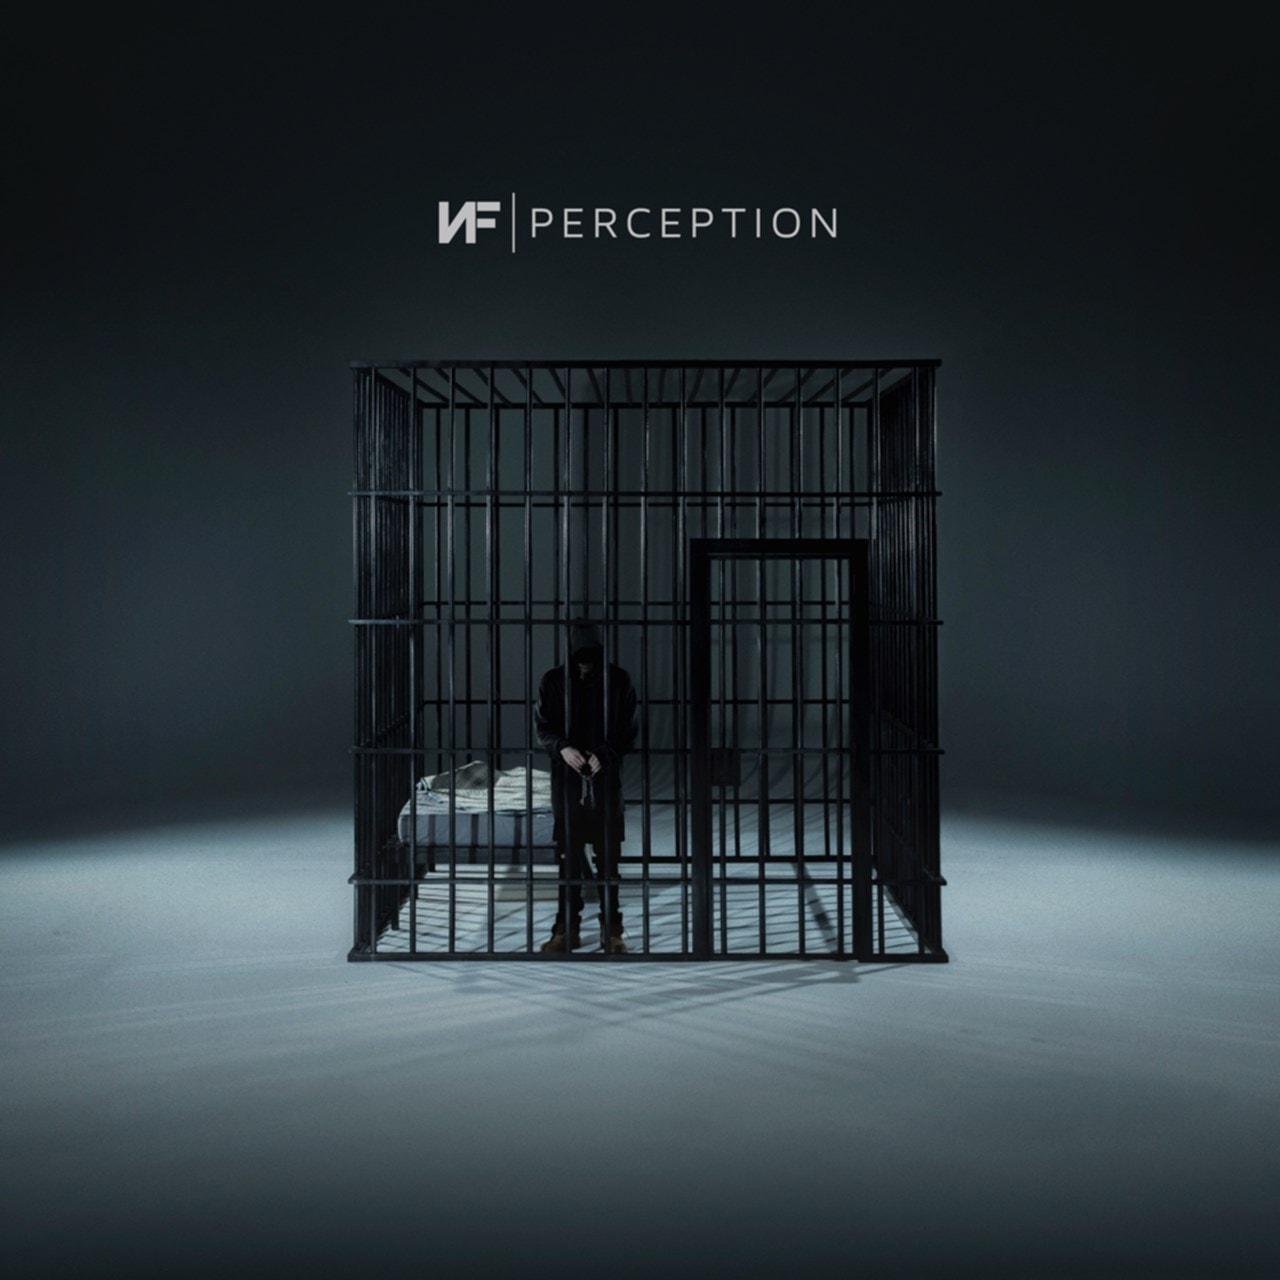 Perception - 1